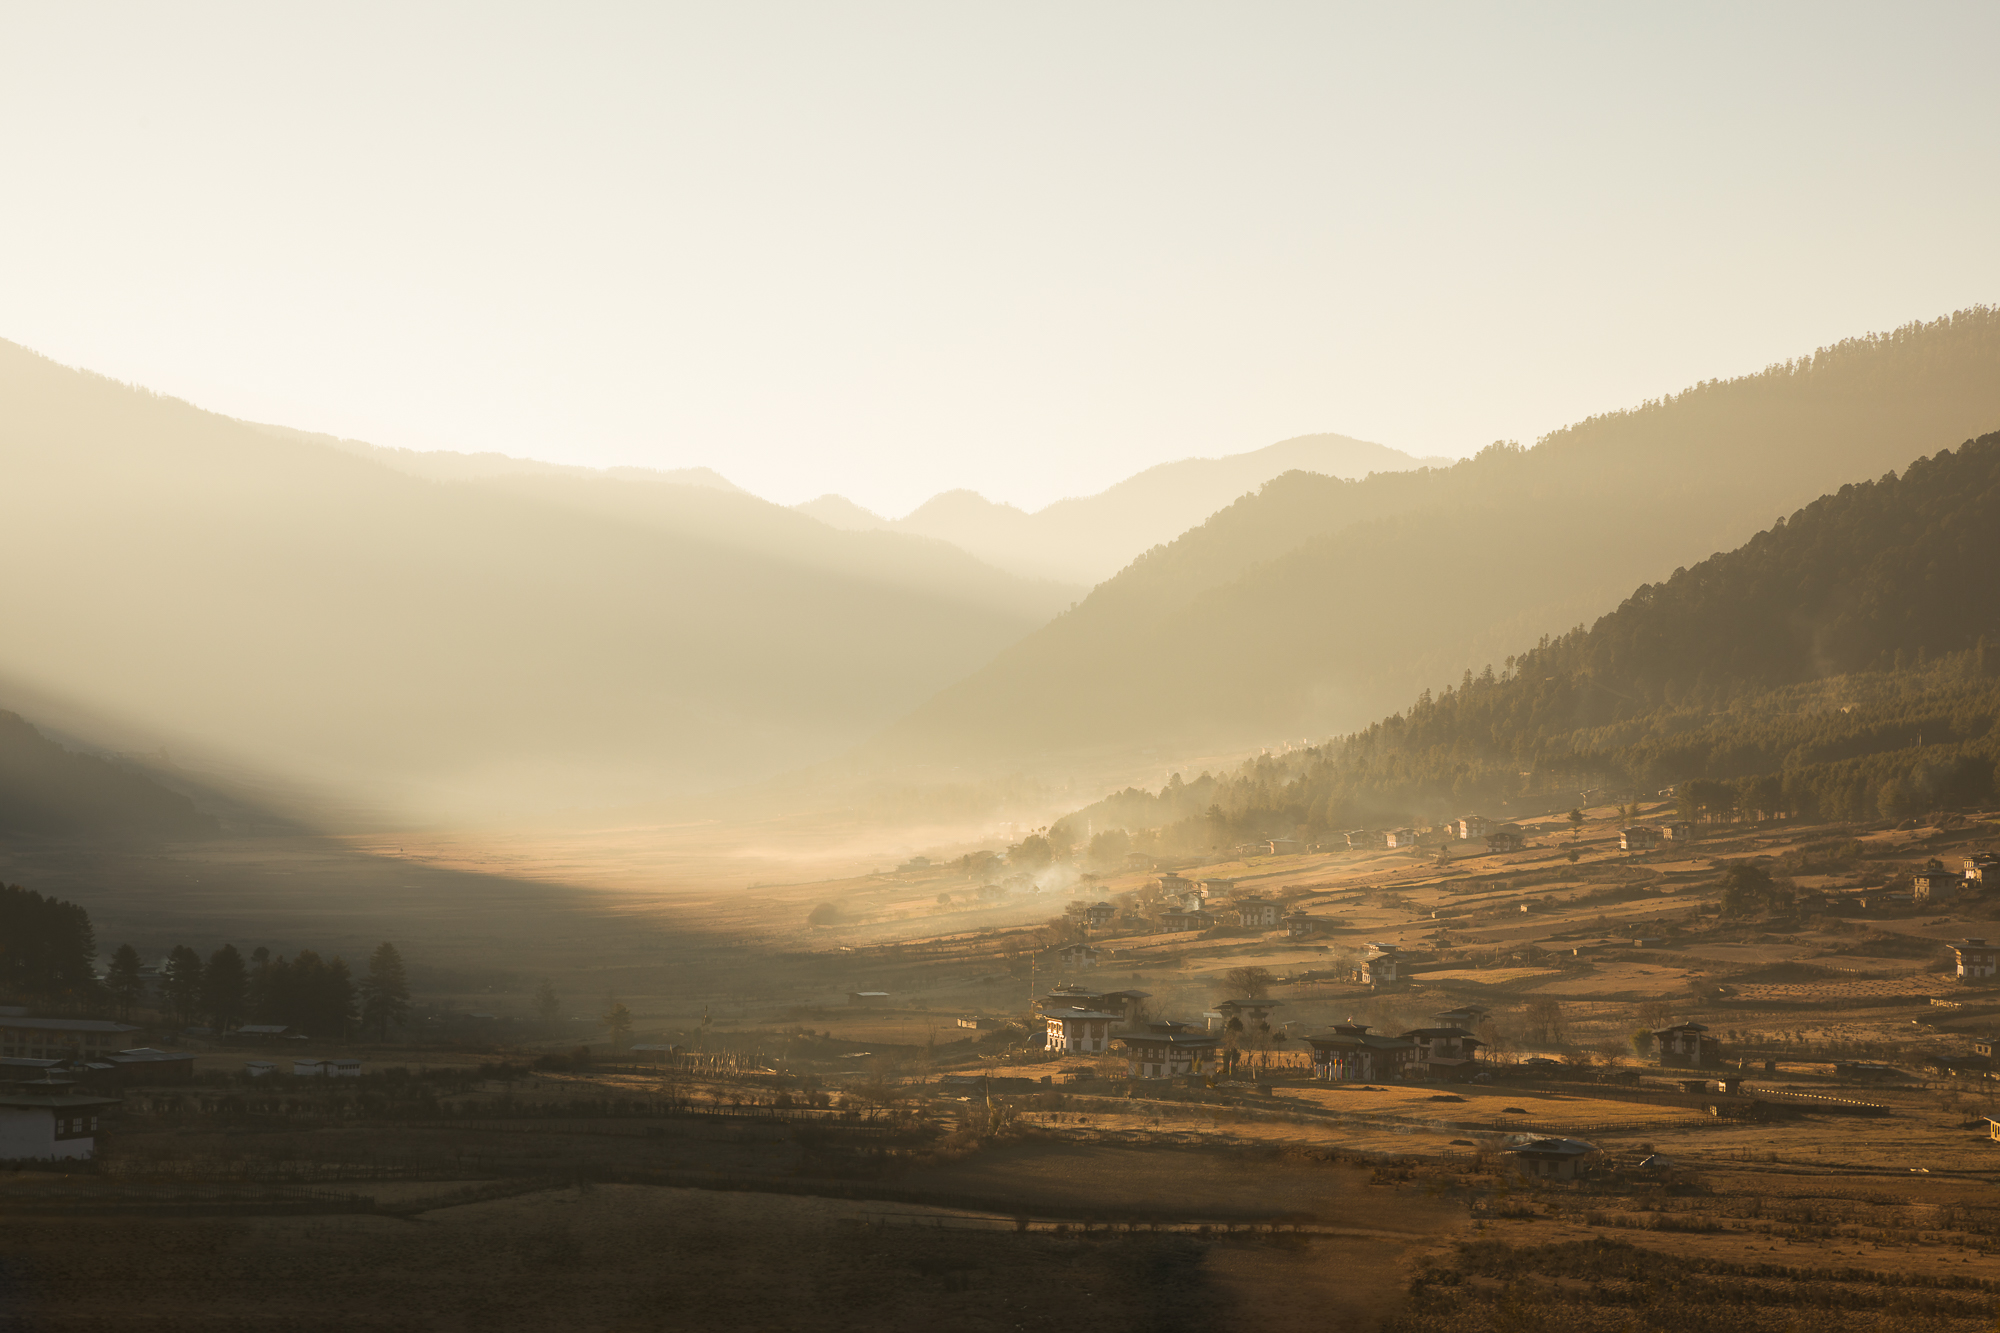 Paul Craig Interior Photographer Personal Work Bhutan Gangtey Valley